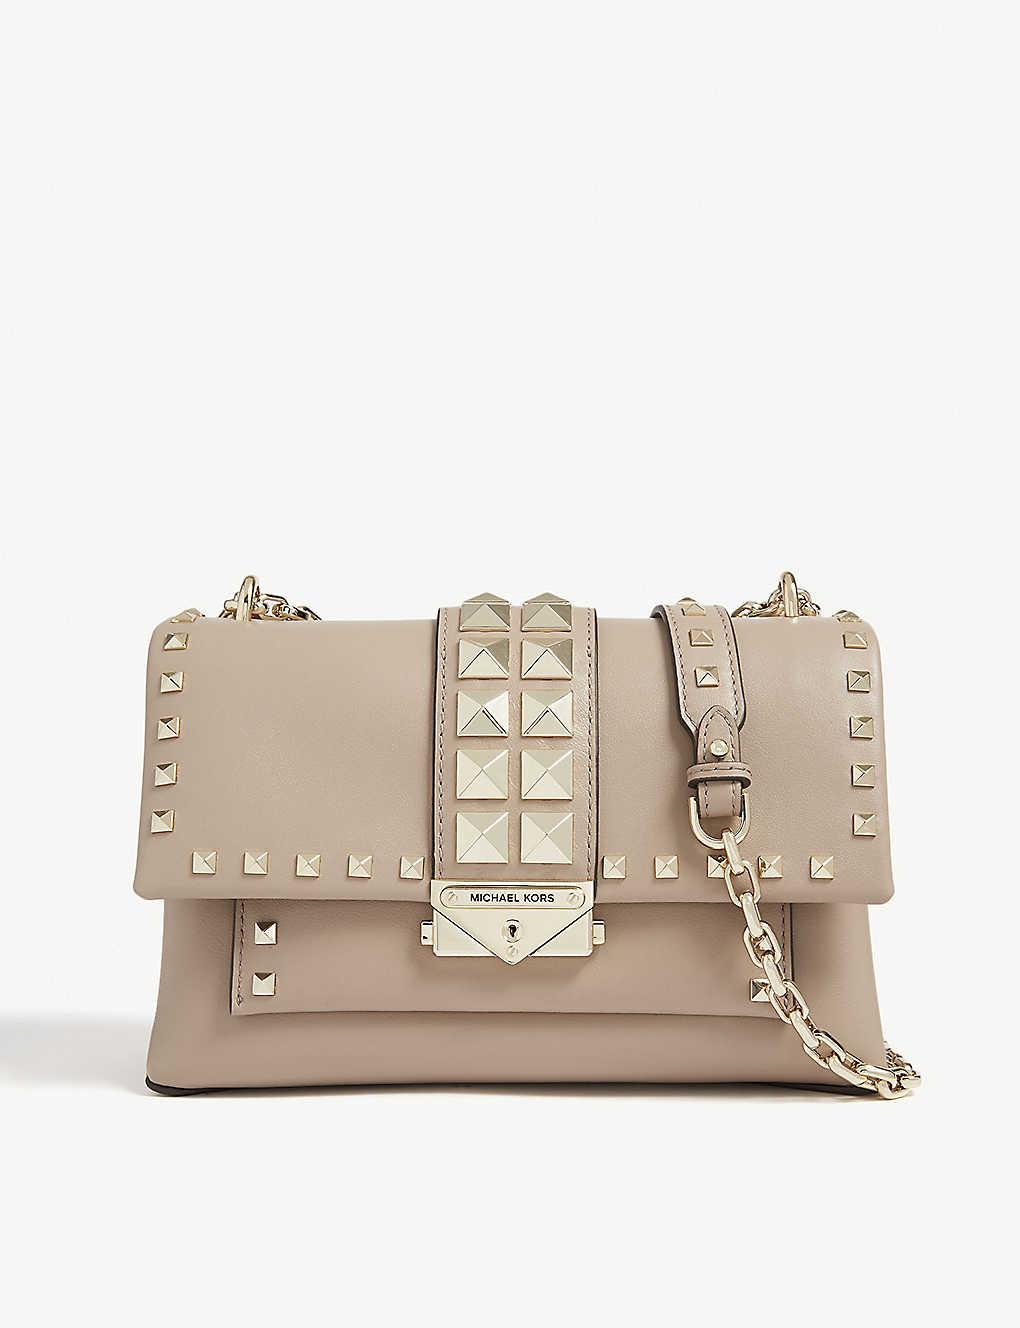 92b23ef712f9 MICHAEL MICHAEL KORS - Studded Cece shoulder bag | Selfridges.com